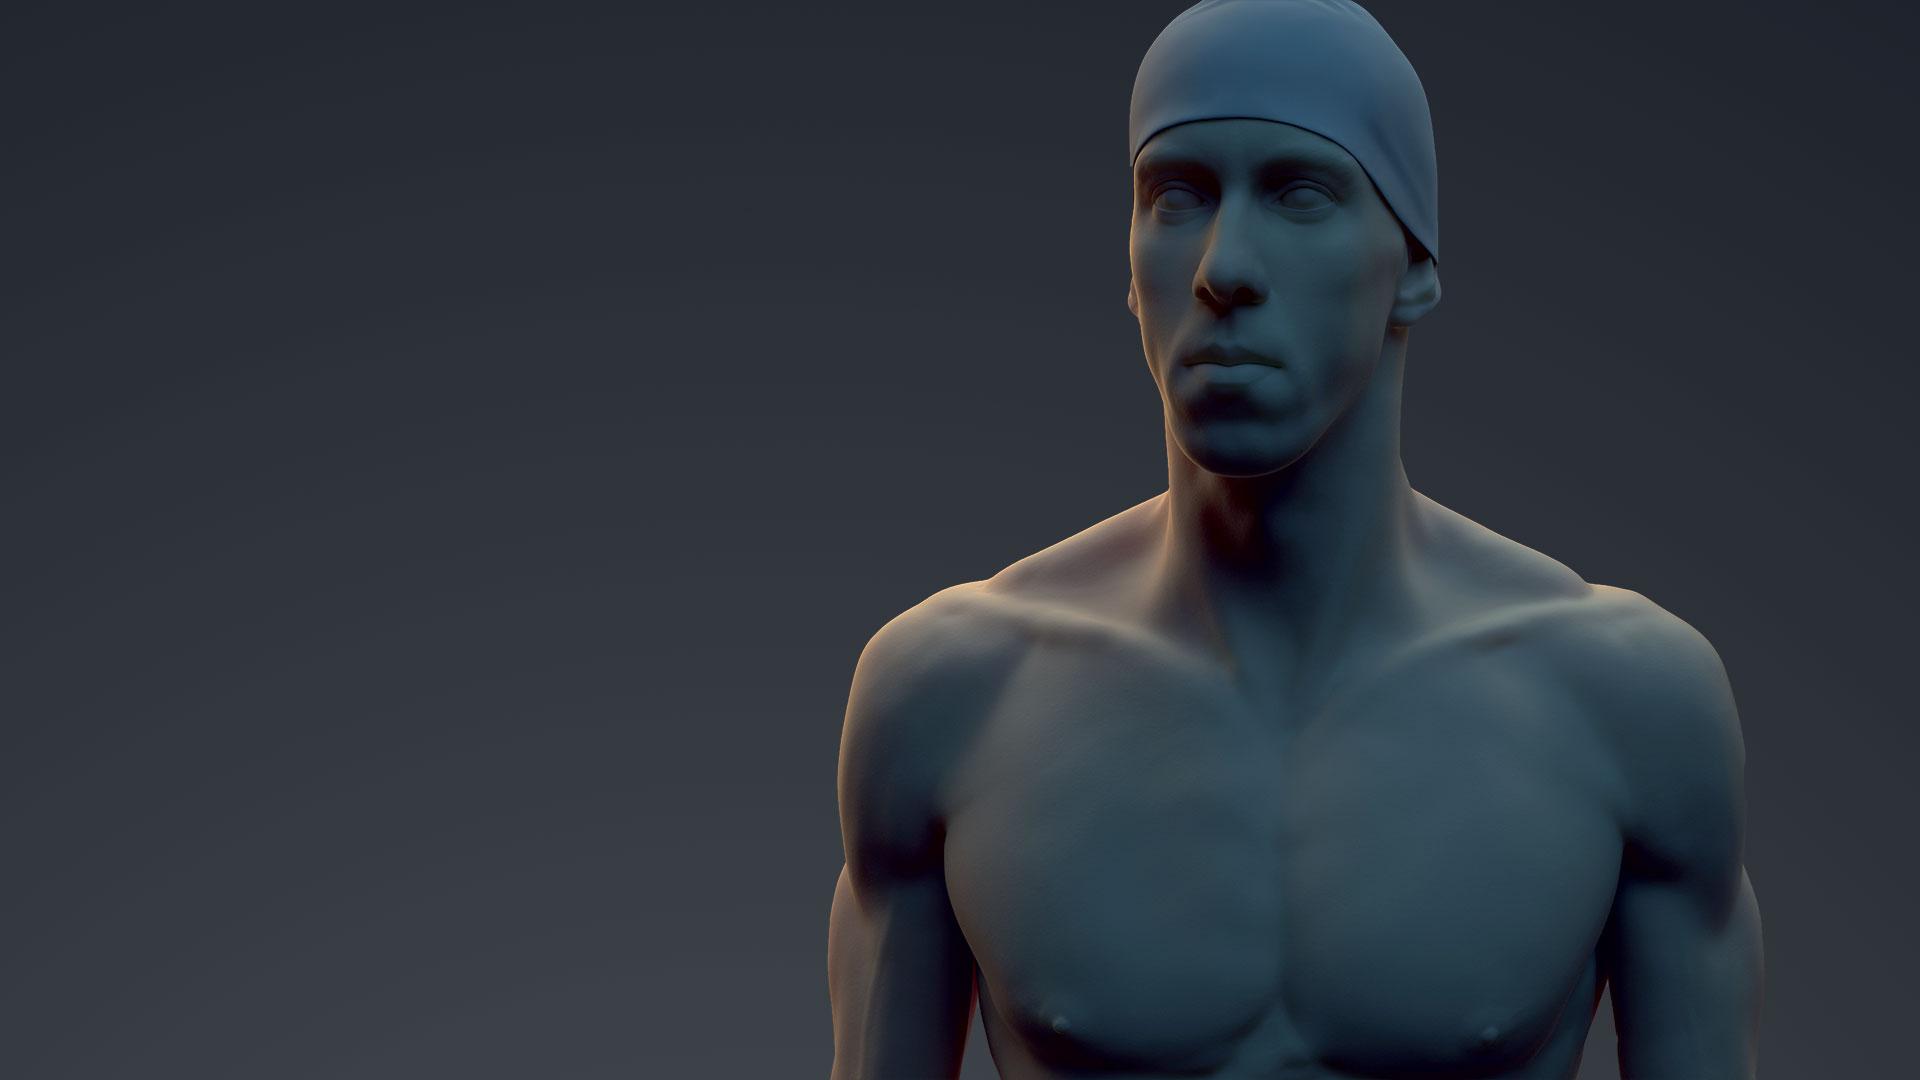 Sculpt realistic anatomy in ZBrush | Creative Bloq